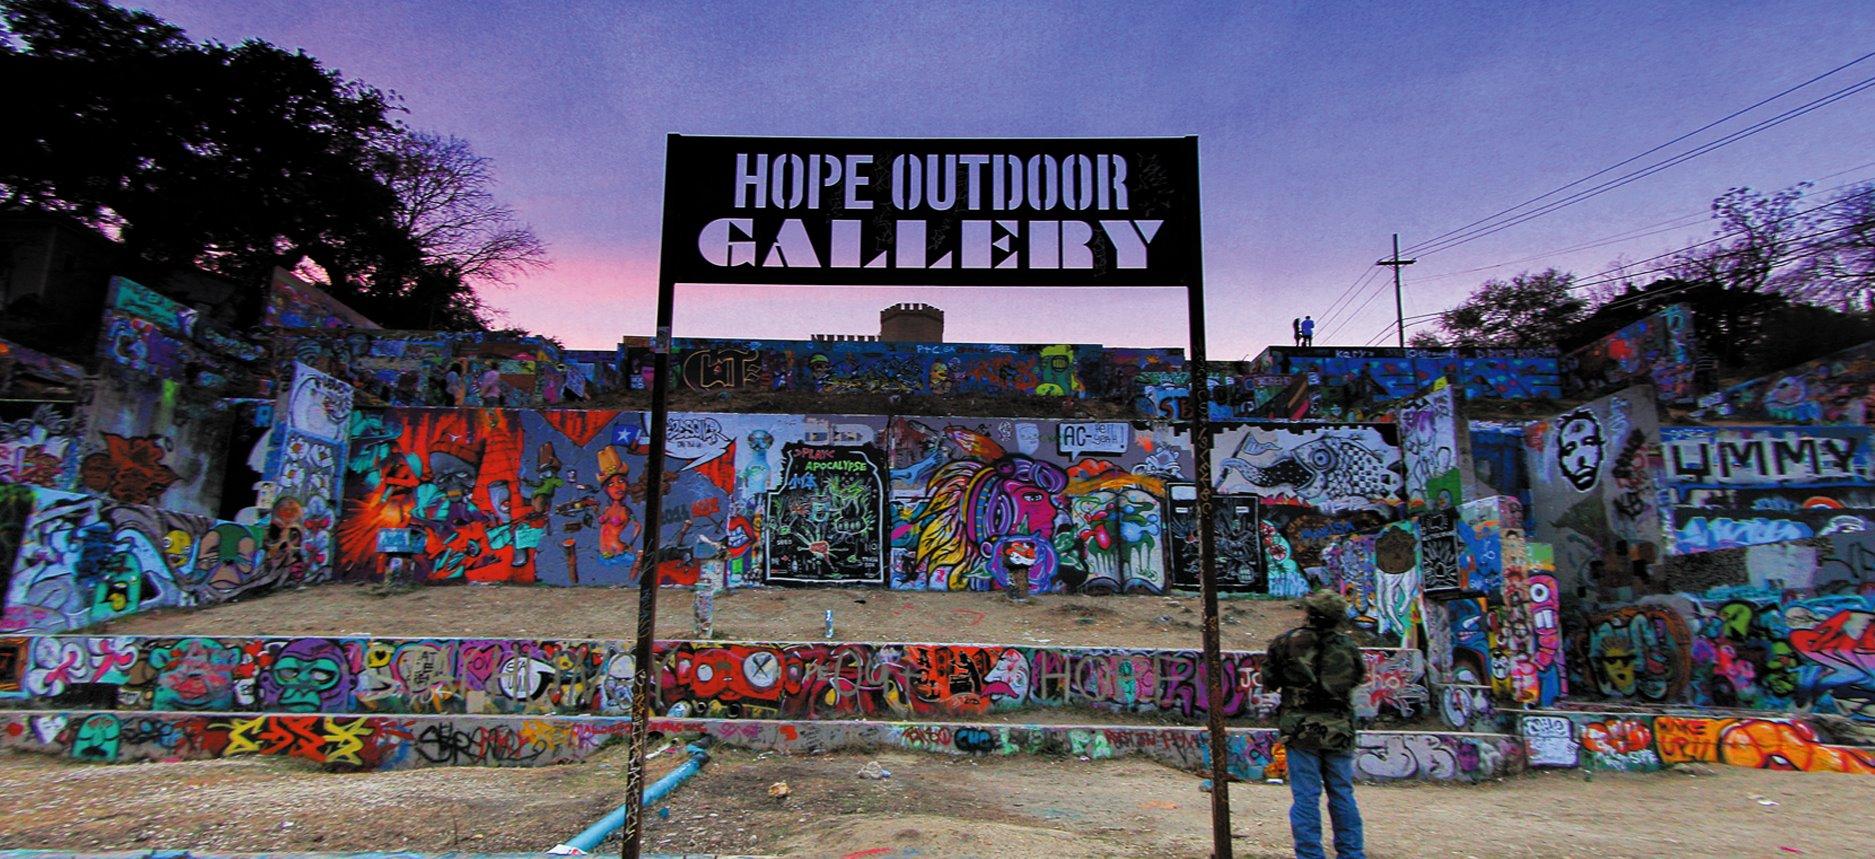 Graffiti Stickers For Walls Keeping Austin Weird Graffiti And Urban Branding The